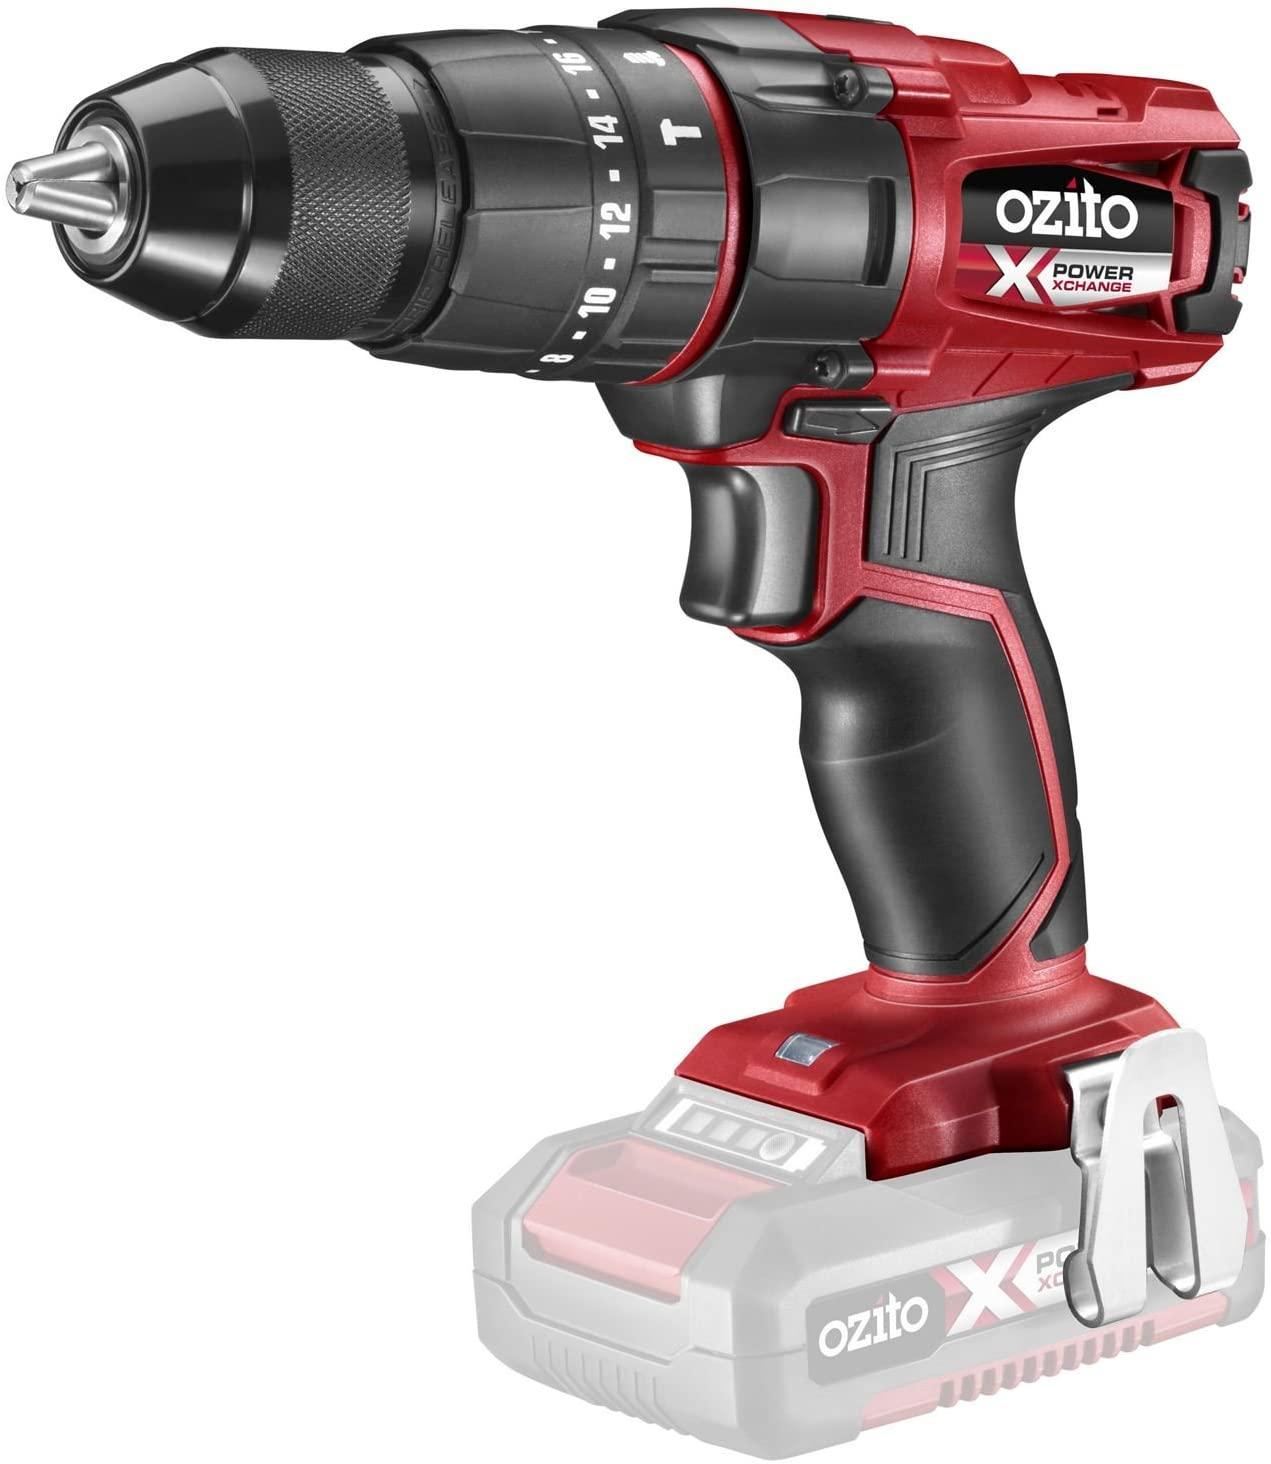 Ozito (Einhell) Power X-Change 18V Li-Ion Cordless Hammer Drill - Bare Unit - PXHDS-301U - £32.95 @ CPC Farnell